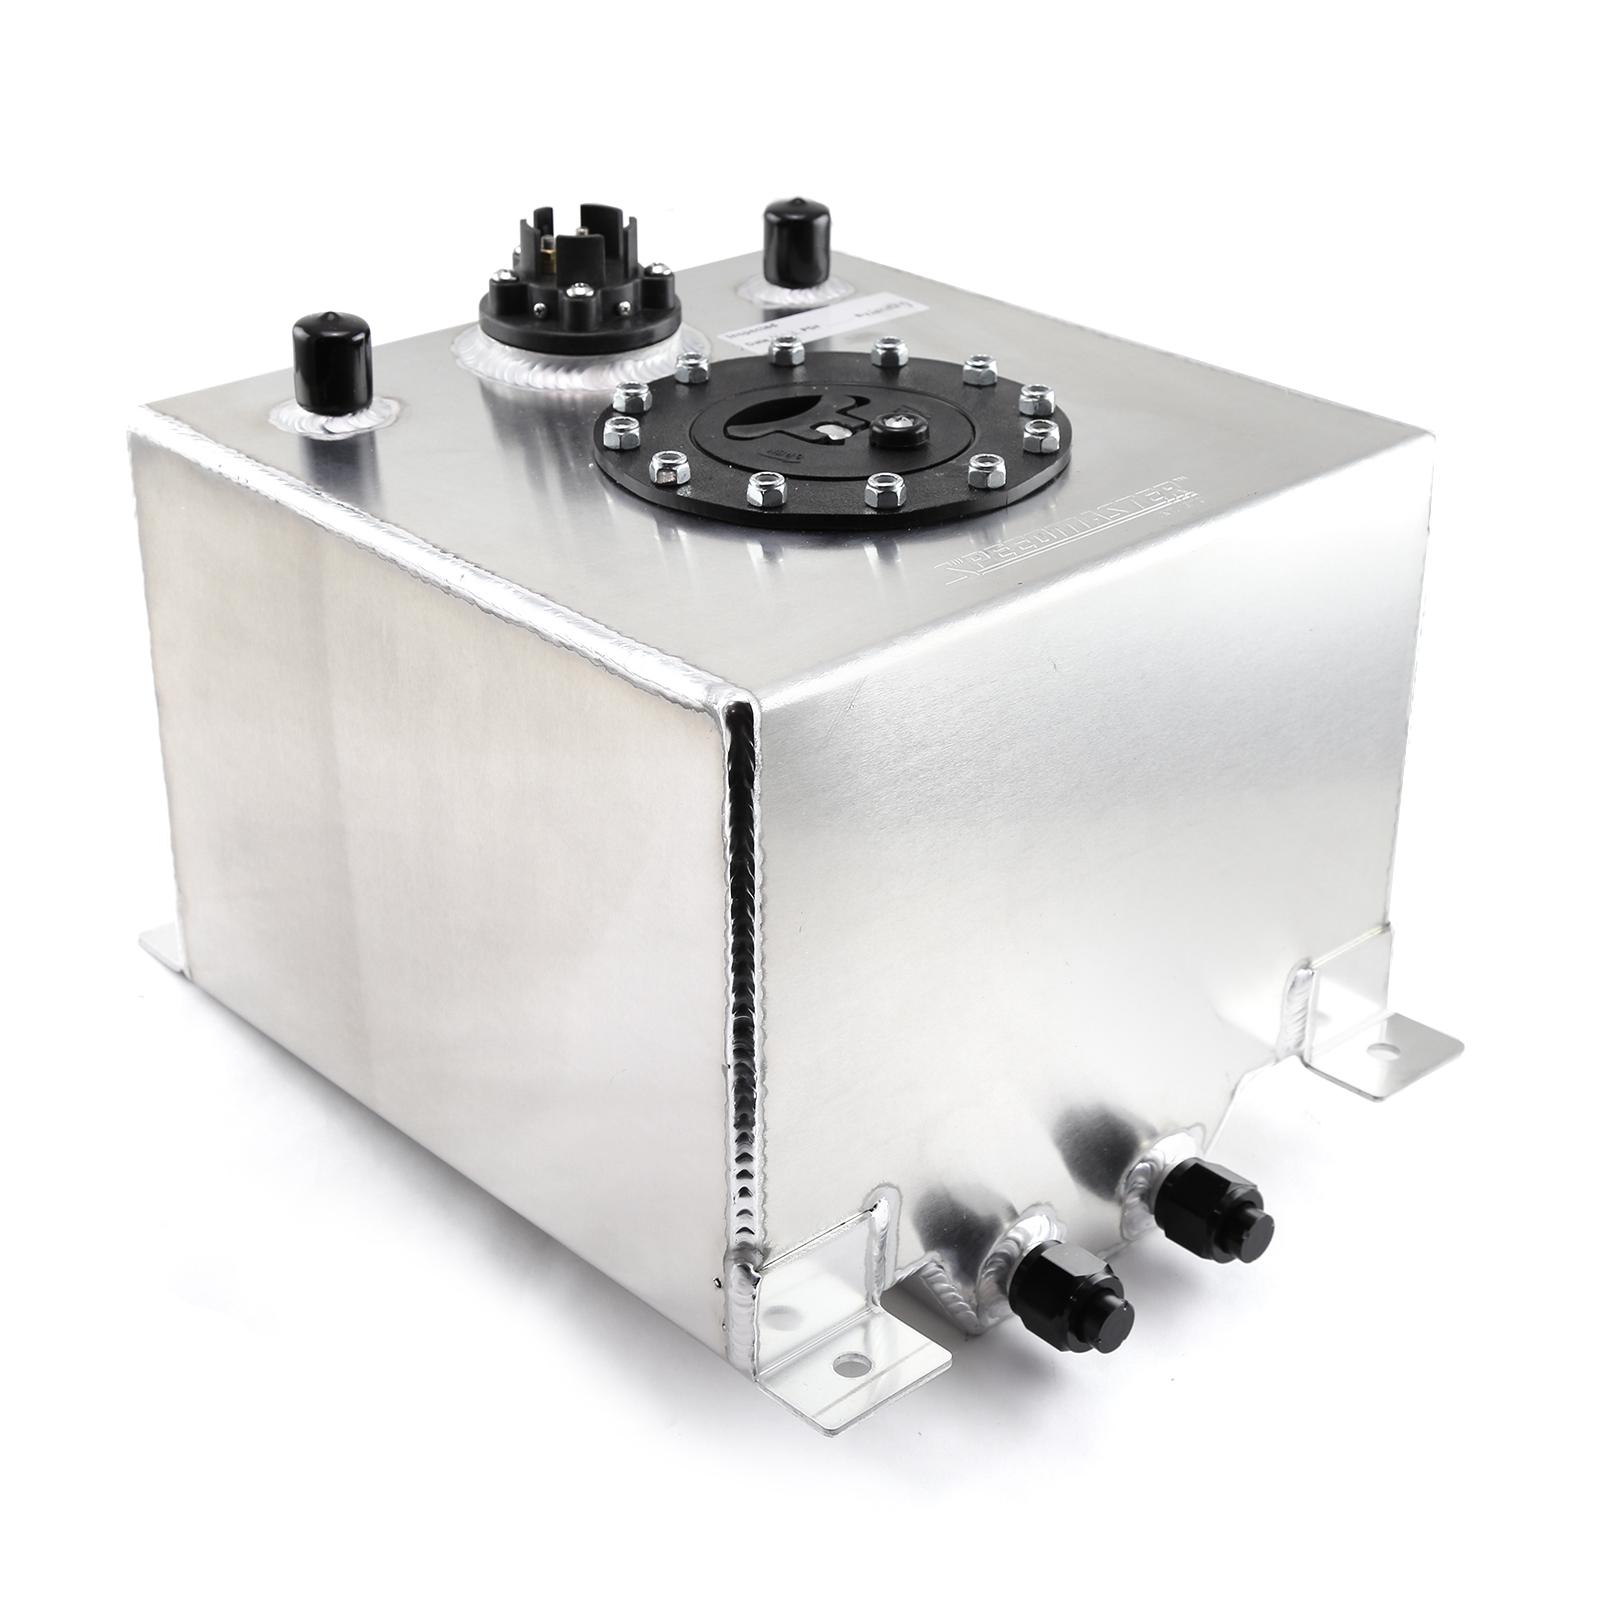 Speedmaster 5 Gallon / 20 Litre Aluminum Fuel Cell w/Sending Unit